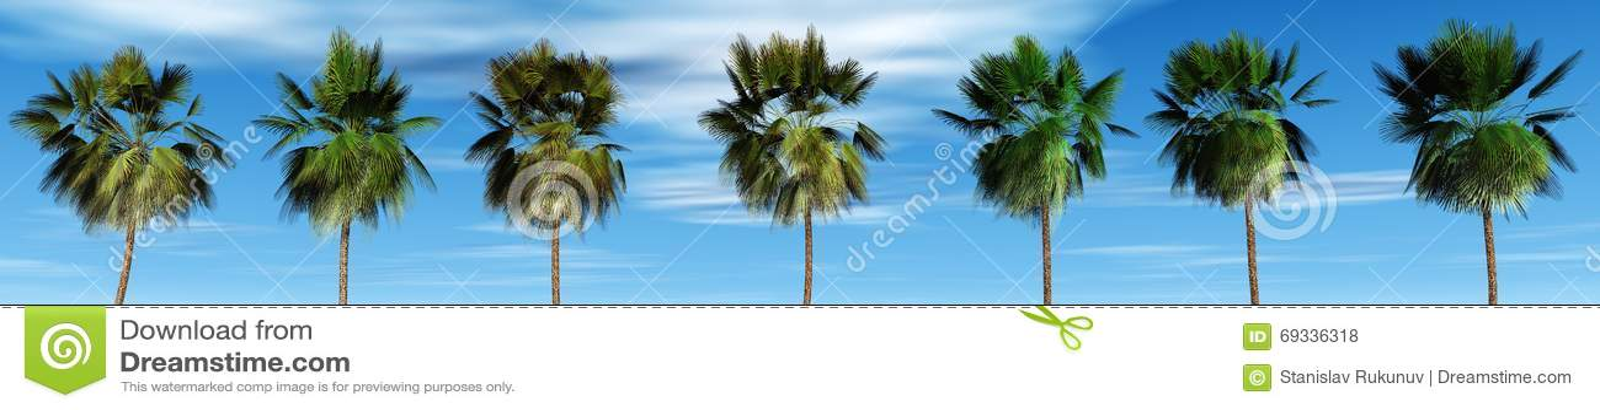 Mexicaanse palmen tegen de hemel, tropisch panorama